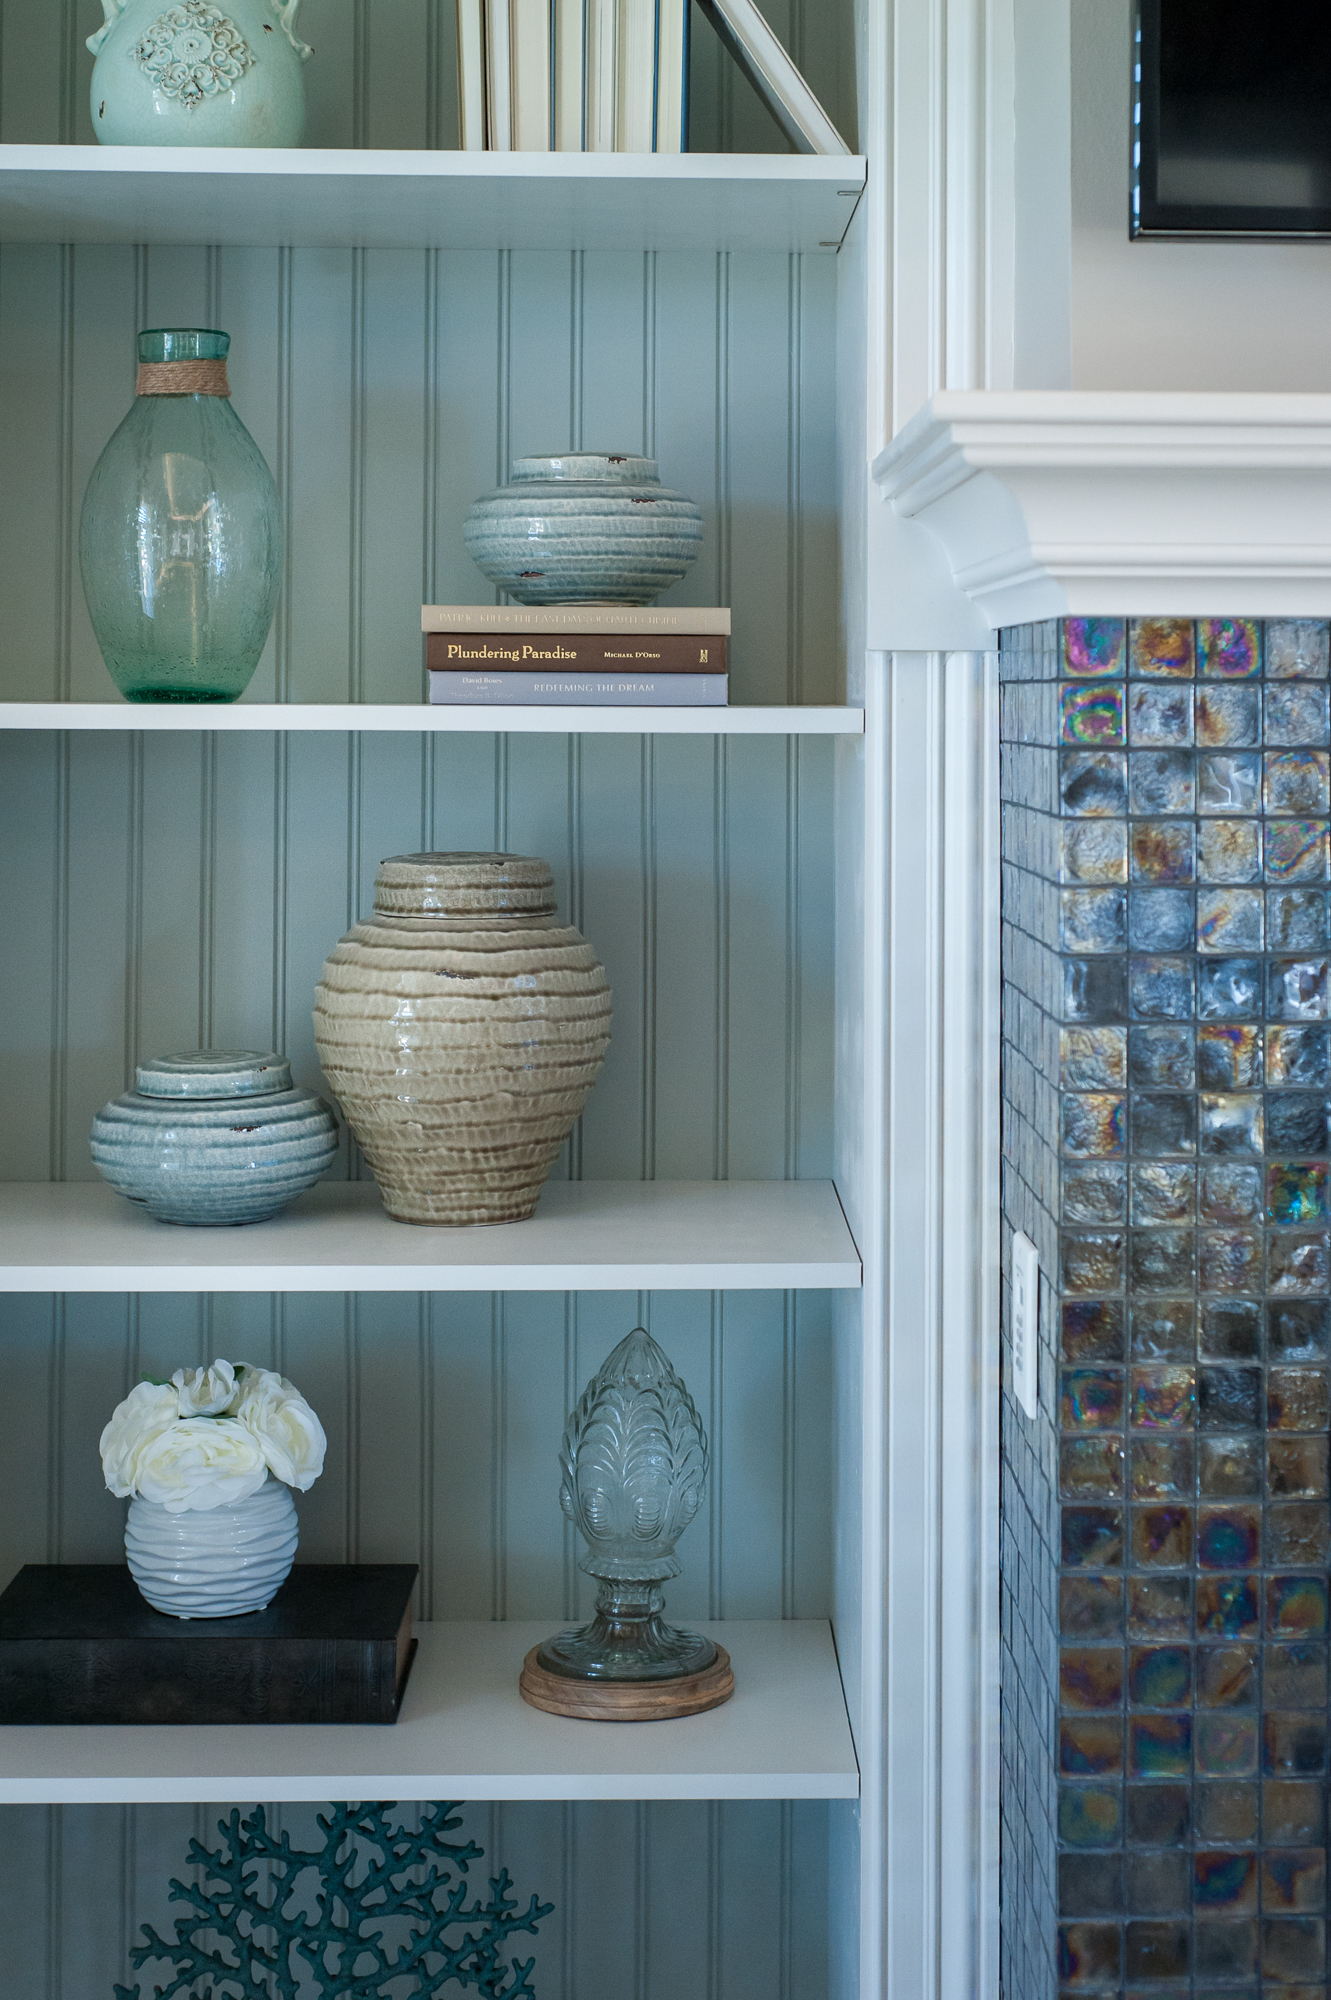 Micamy_Design_Studio_Interior_Design_Artisan_Lakes_Clubhouse_Serene_Coastal_Glass_Mosaic_Tile_Backsplash_Fireplace_SherwinWilliams_Crossville_Blue_.jpg